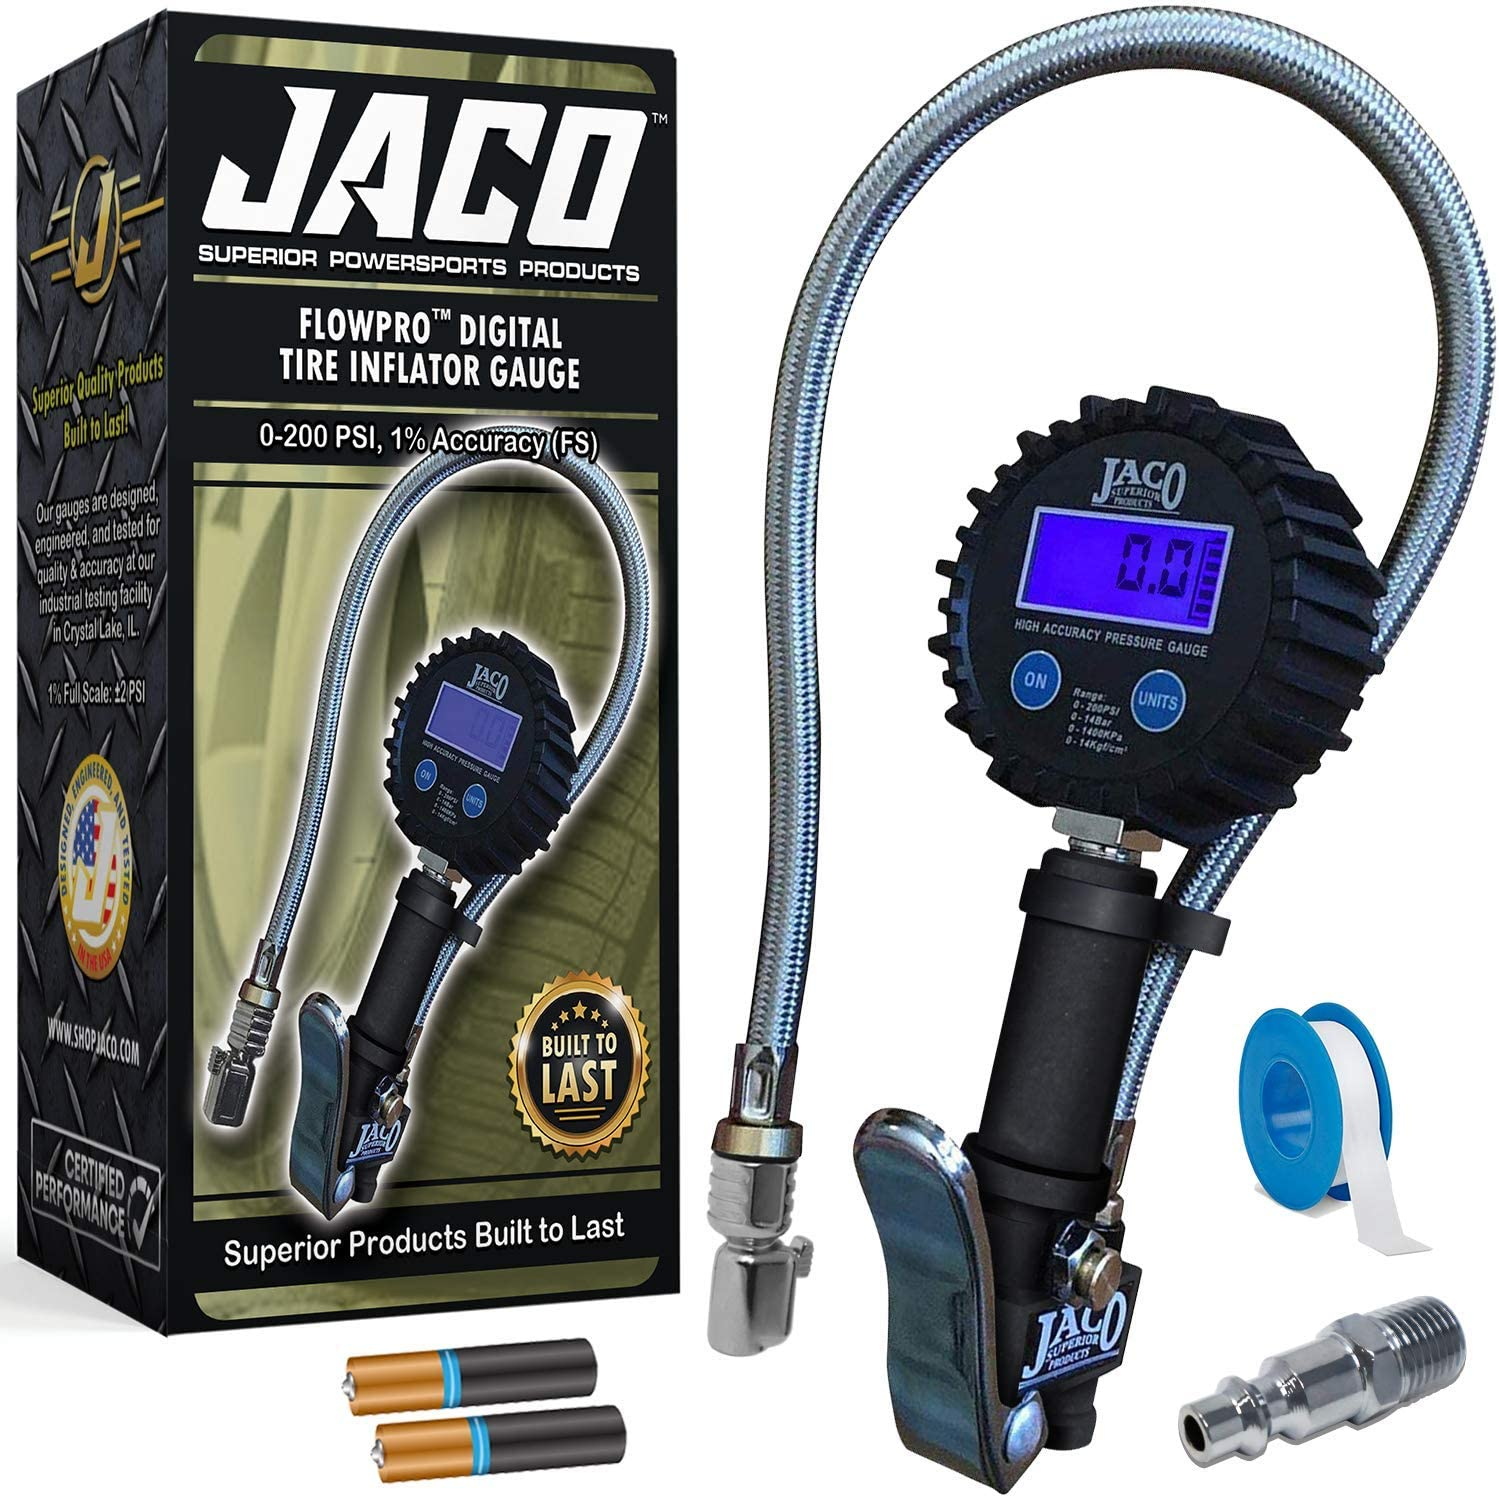 JACO FlowPro 2.0 Digital Tire Inflator Gauge 200 PSI